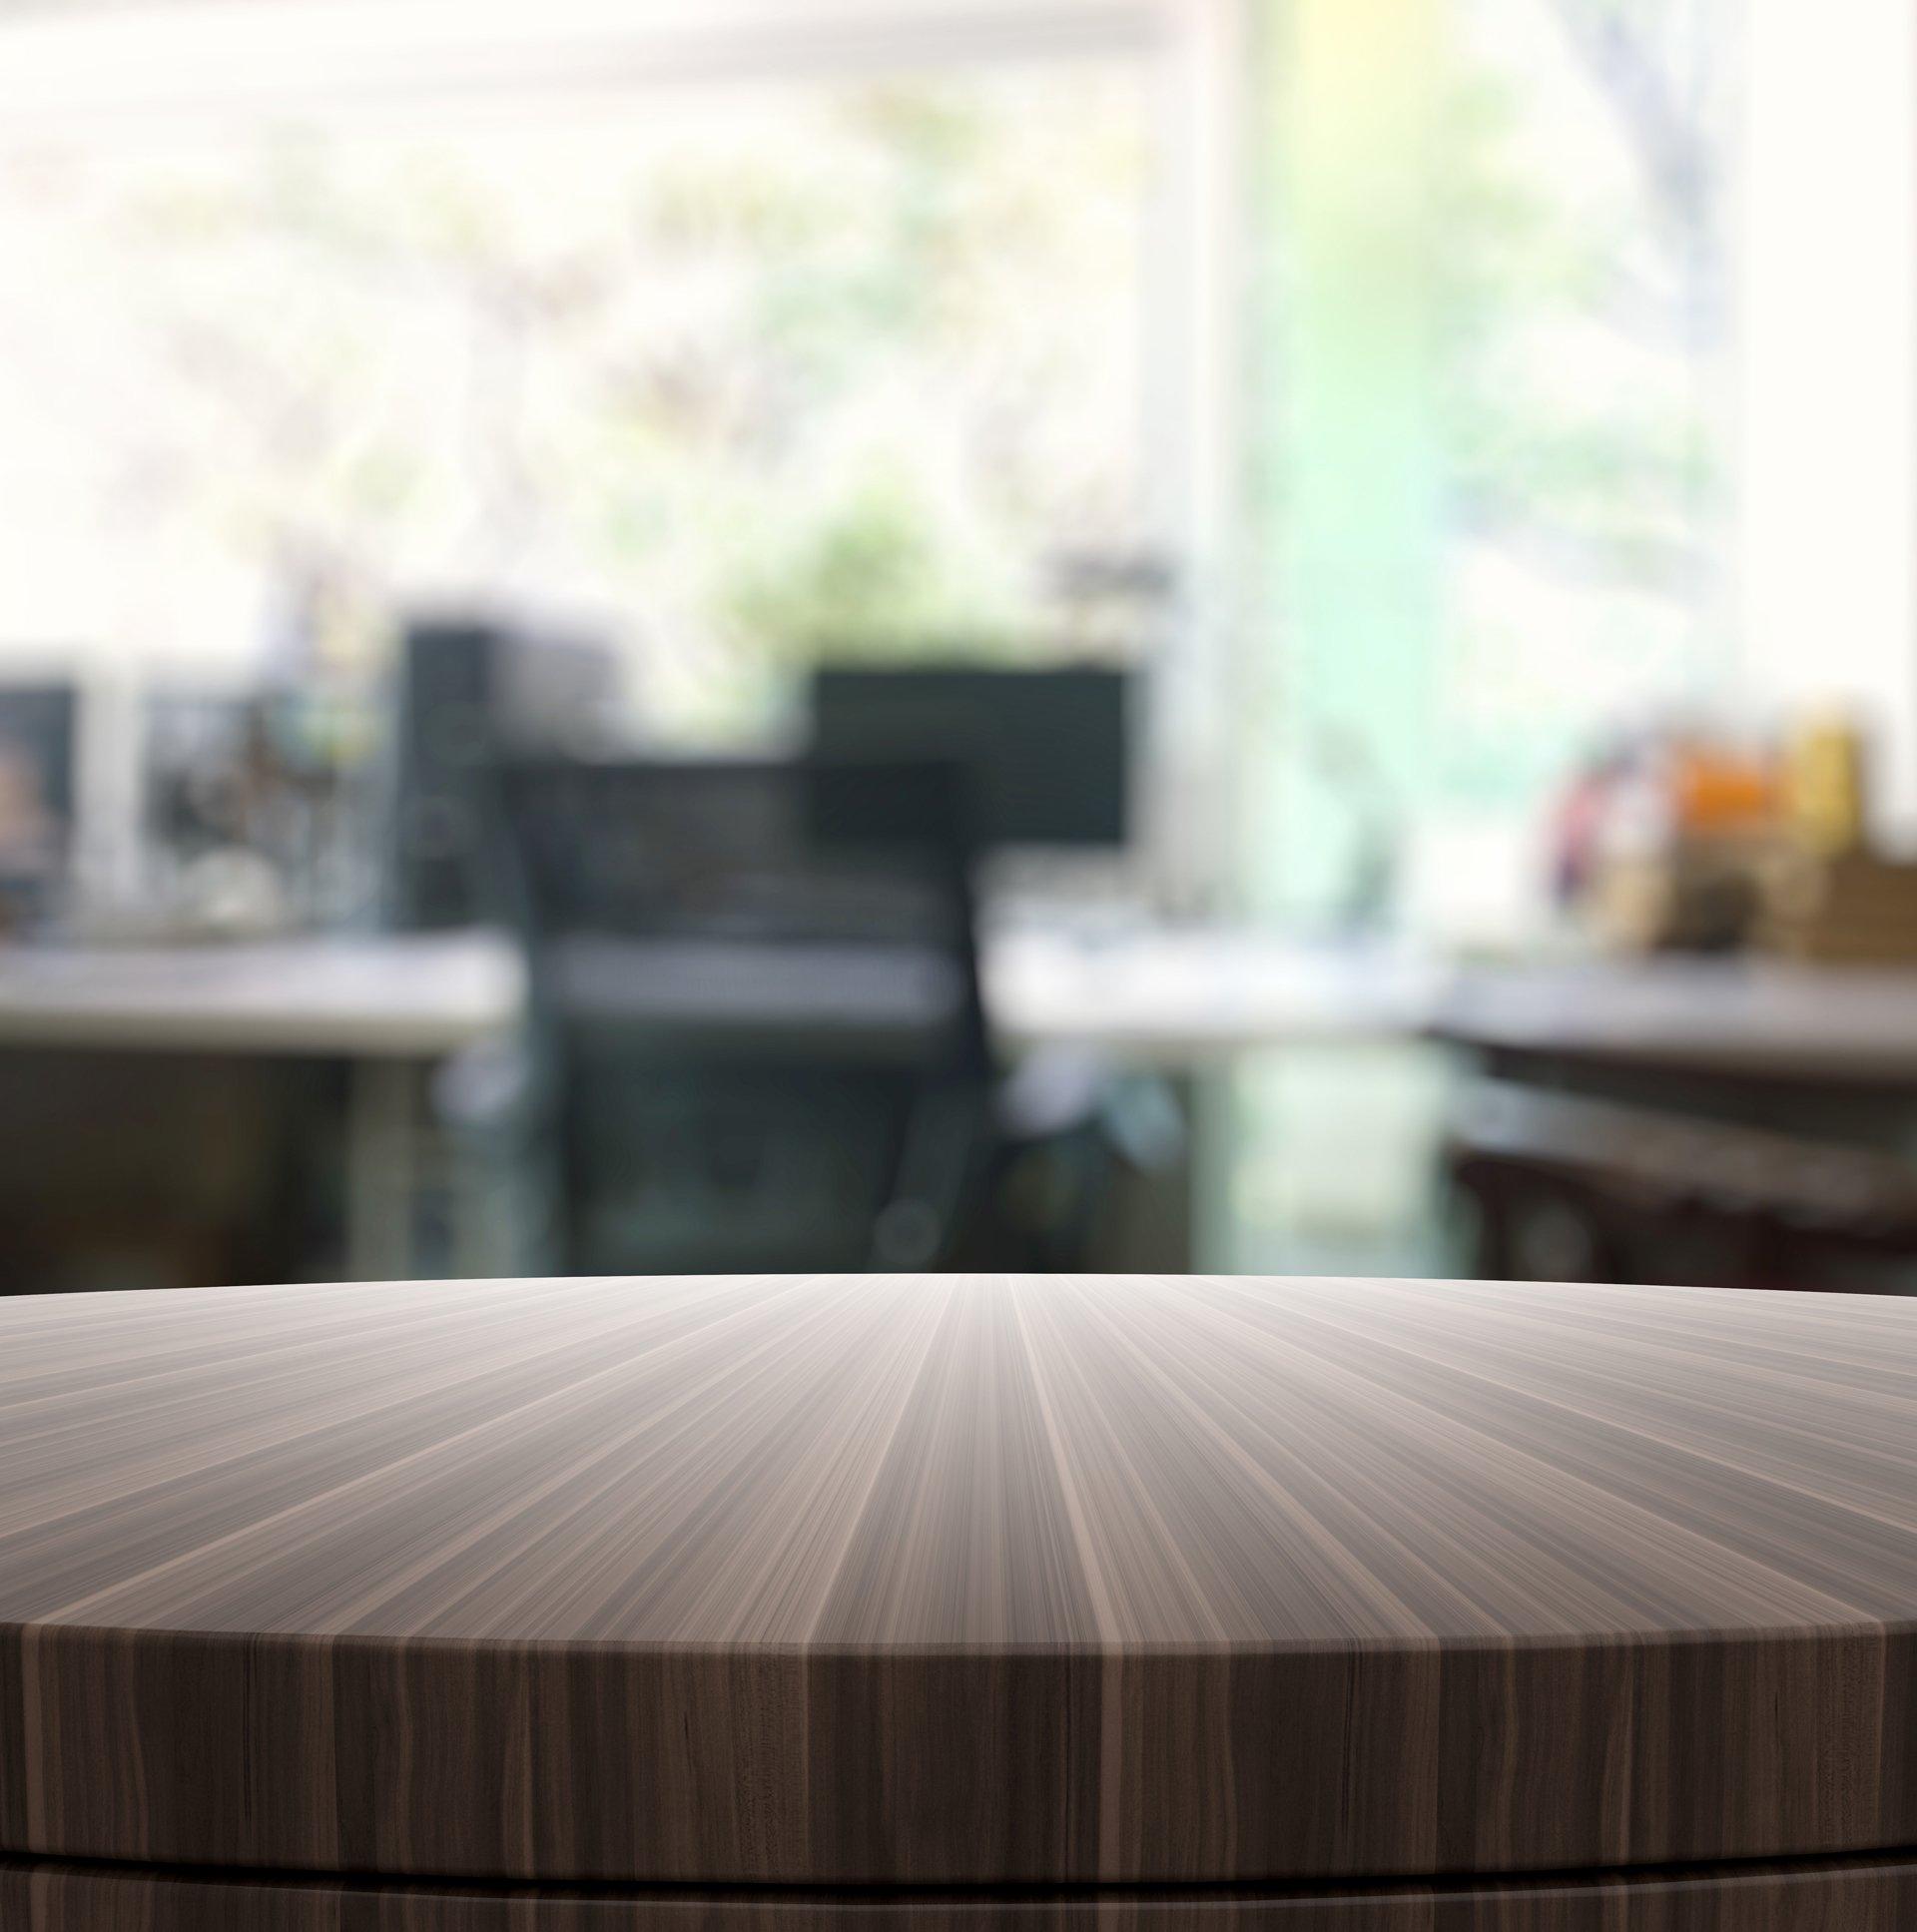 Blurred Office Background JPG